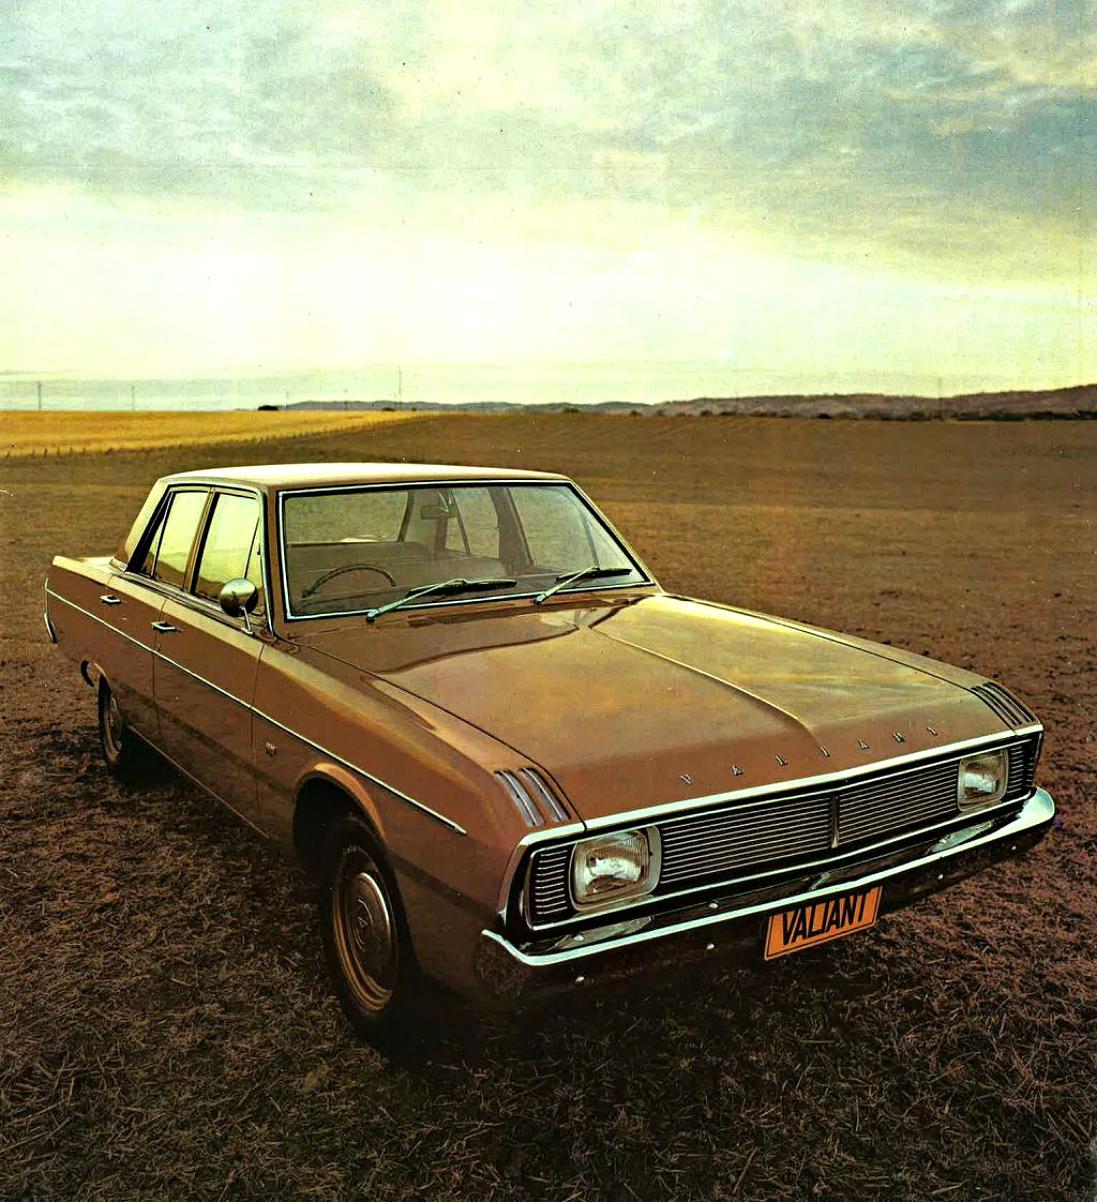 1970 VG Valiant 2